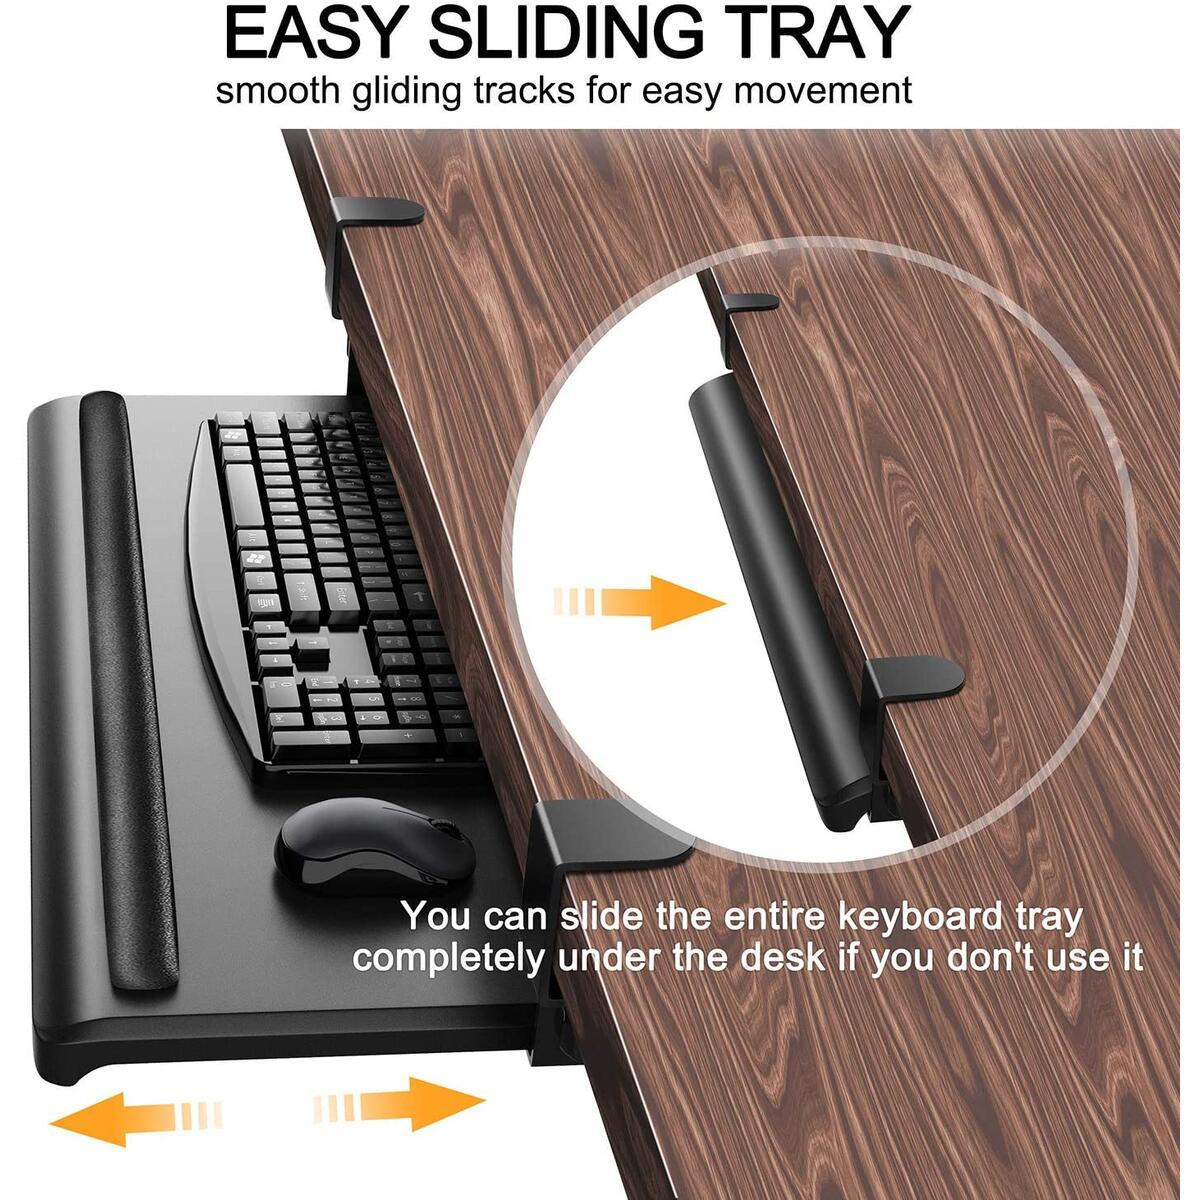 Keyboard Tray Under Desk - QooWare 27.6 x 12.2